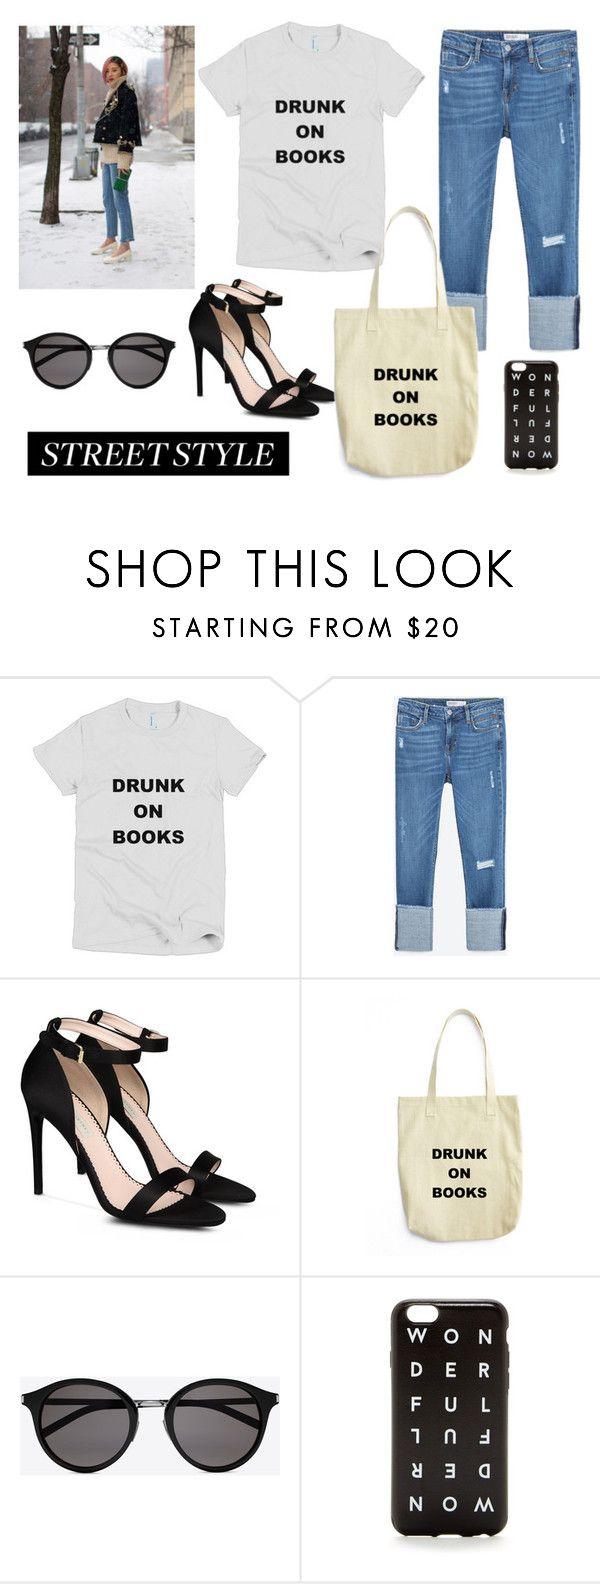 """Street Style"" by bookandballads ❤ liked on Polyvore featuring Zara, STELLA McCARTNEY, Yves Saint Laurent and J.Crew"